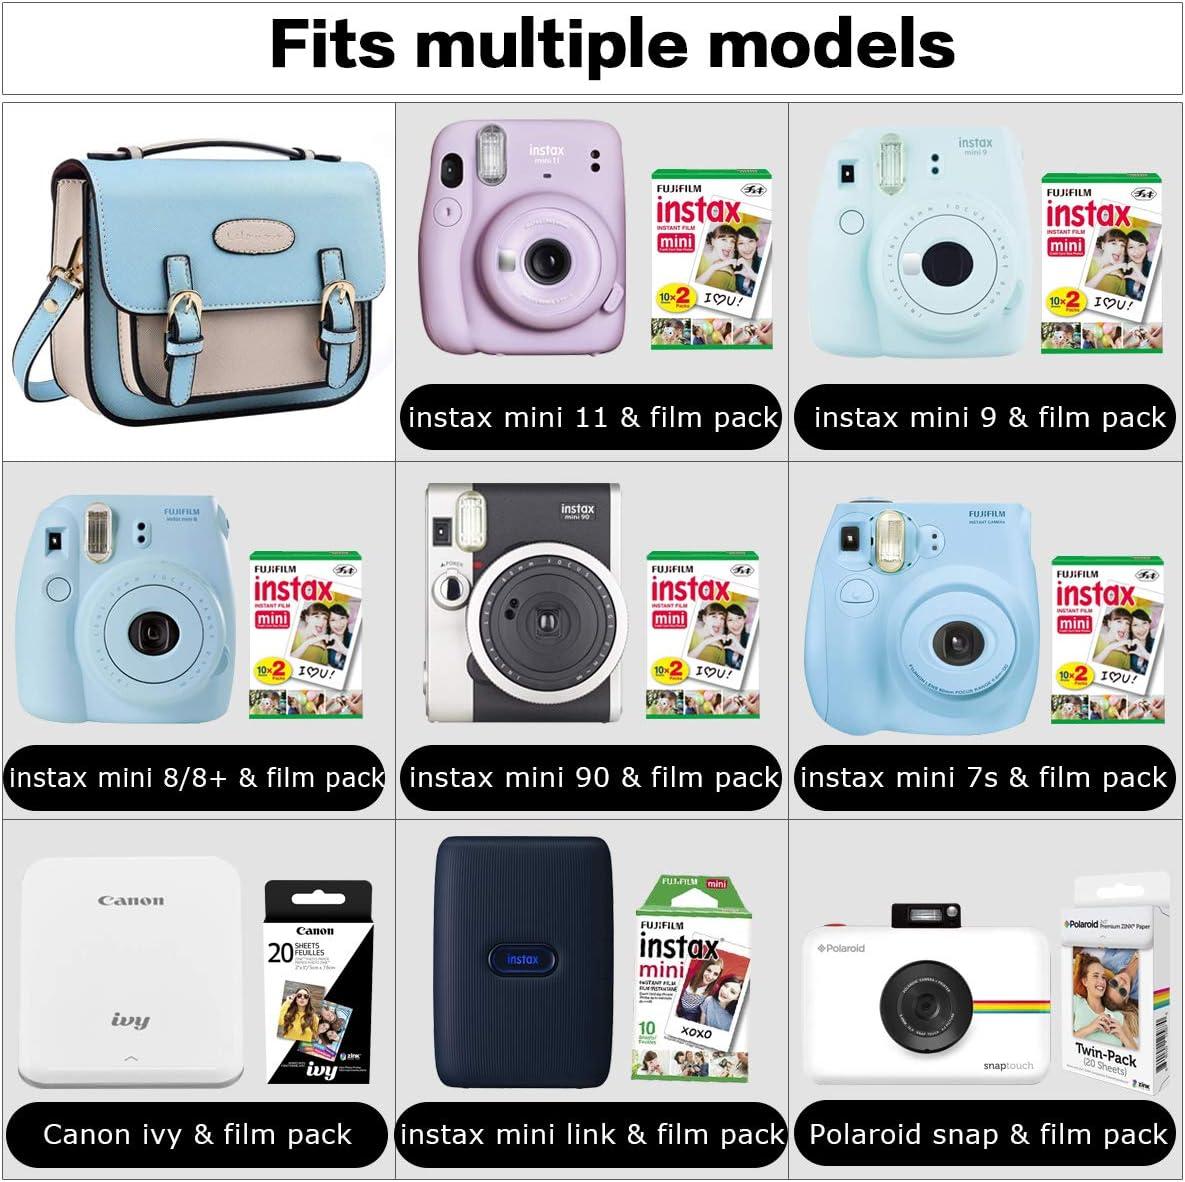 Fujifilm Mini 8 9 Funda de accesorios de la cámara para FUJIFILM Instax Mini 8/Mini 7S/Mini 25/Mini de piel sintética Lalonovo, diseño retro 50s – Funda para Fujifilm Cámara de fotos instantánea